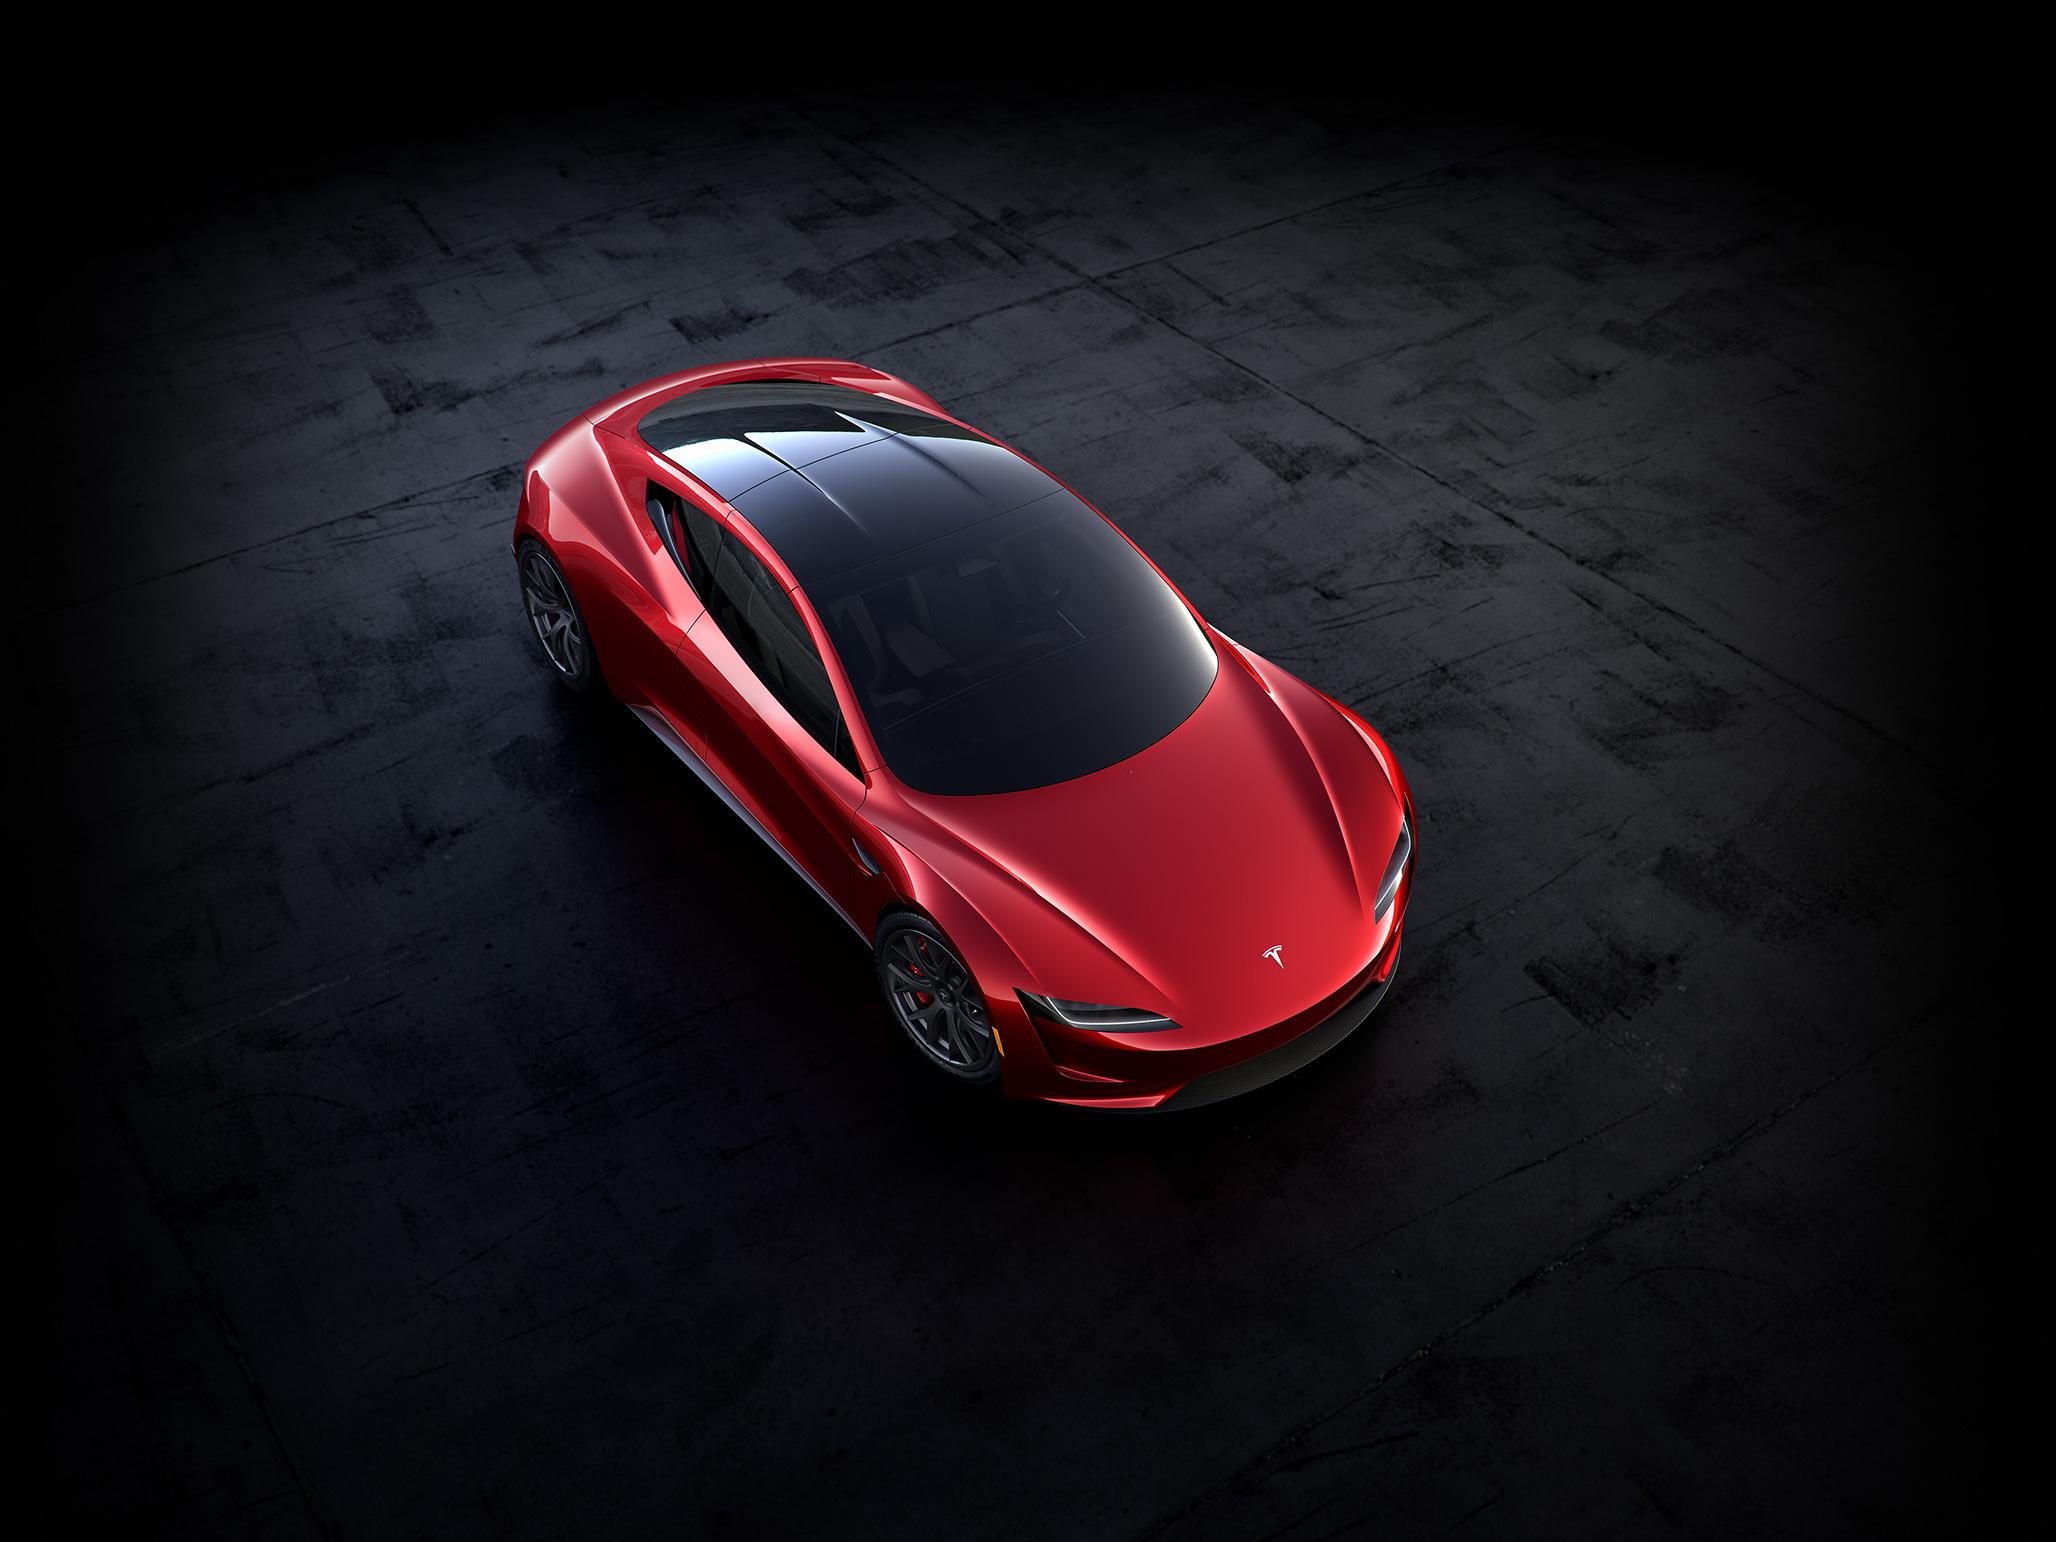 2017 Tesla Roadster Top WORLD LXRY